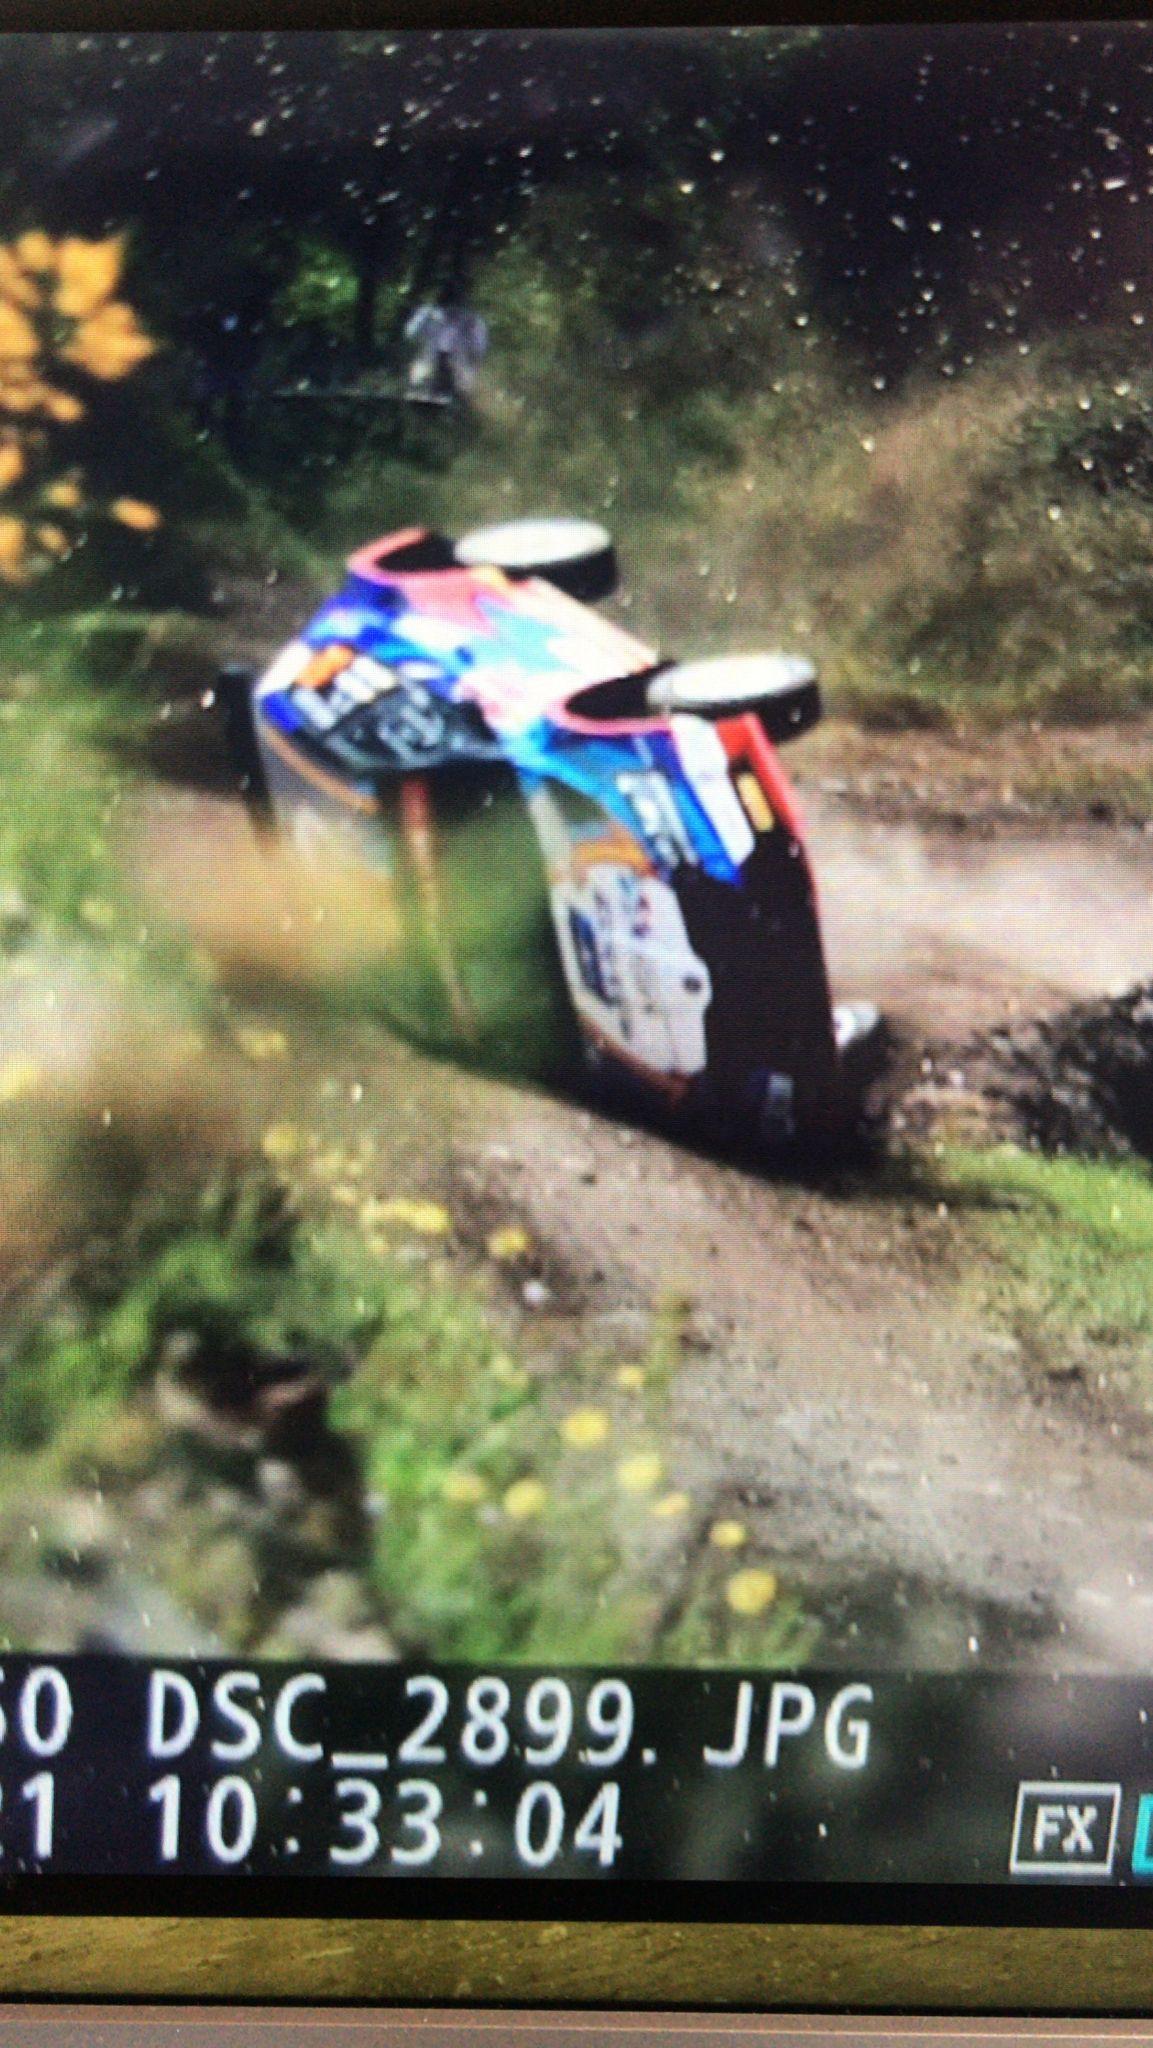 WRC: 54º Vodafone Rallye de Portugal [20-23 de Mayo] - Página 3 E150cuZX0AEYv2K?format=jpg&name=large